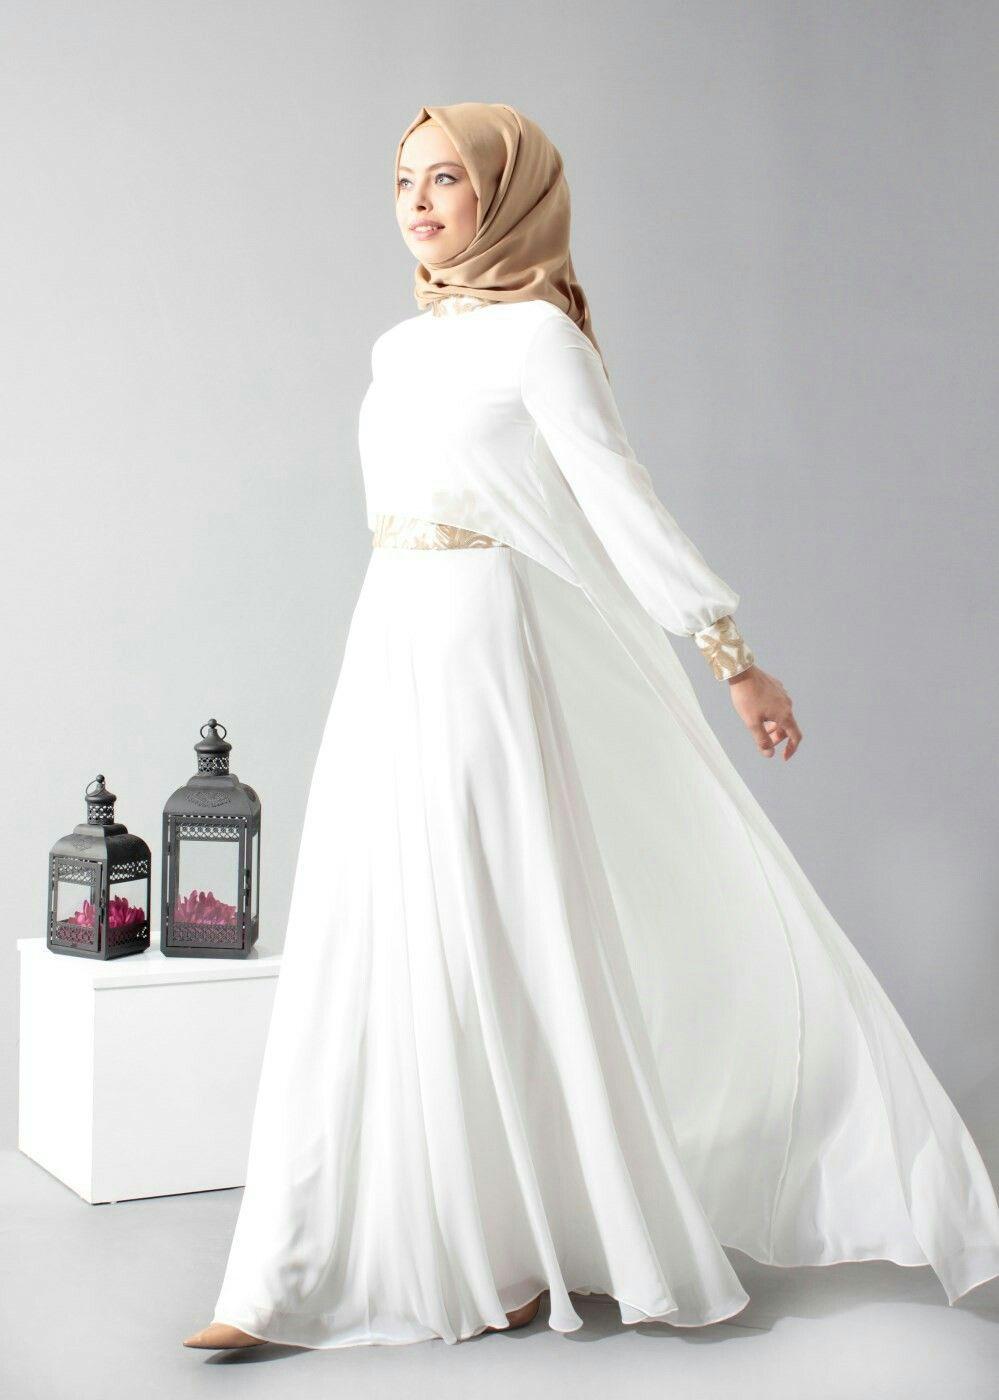 Elbise modelleri kıyafet pinterest fashion forward and fashion